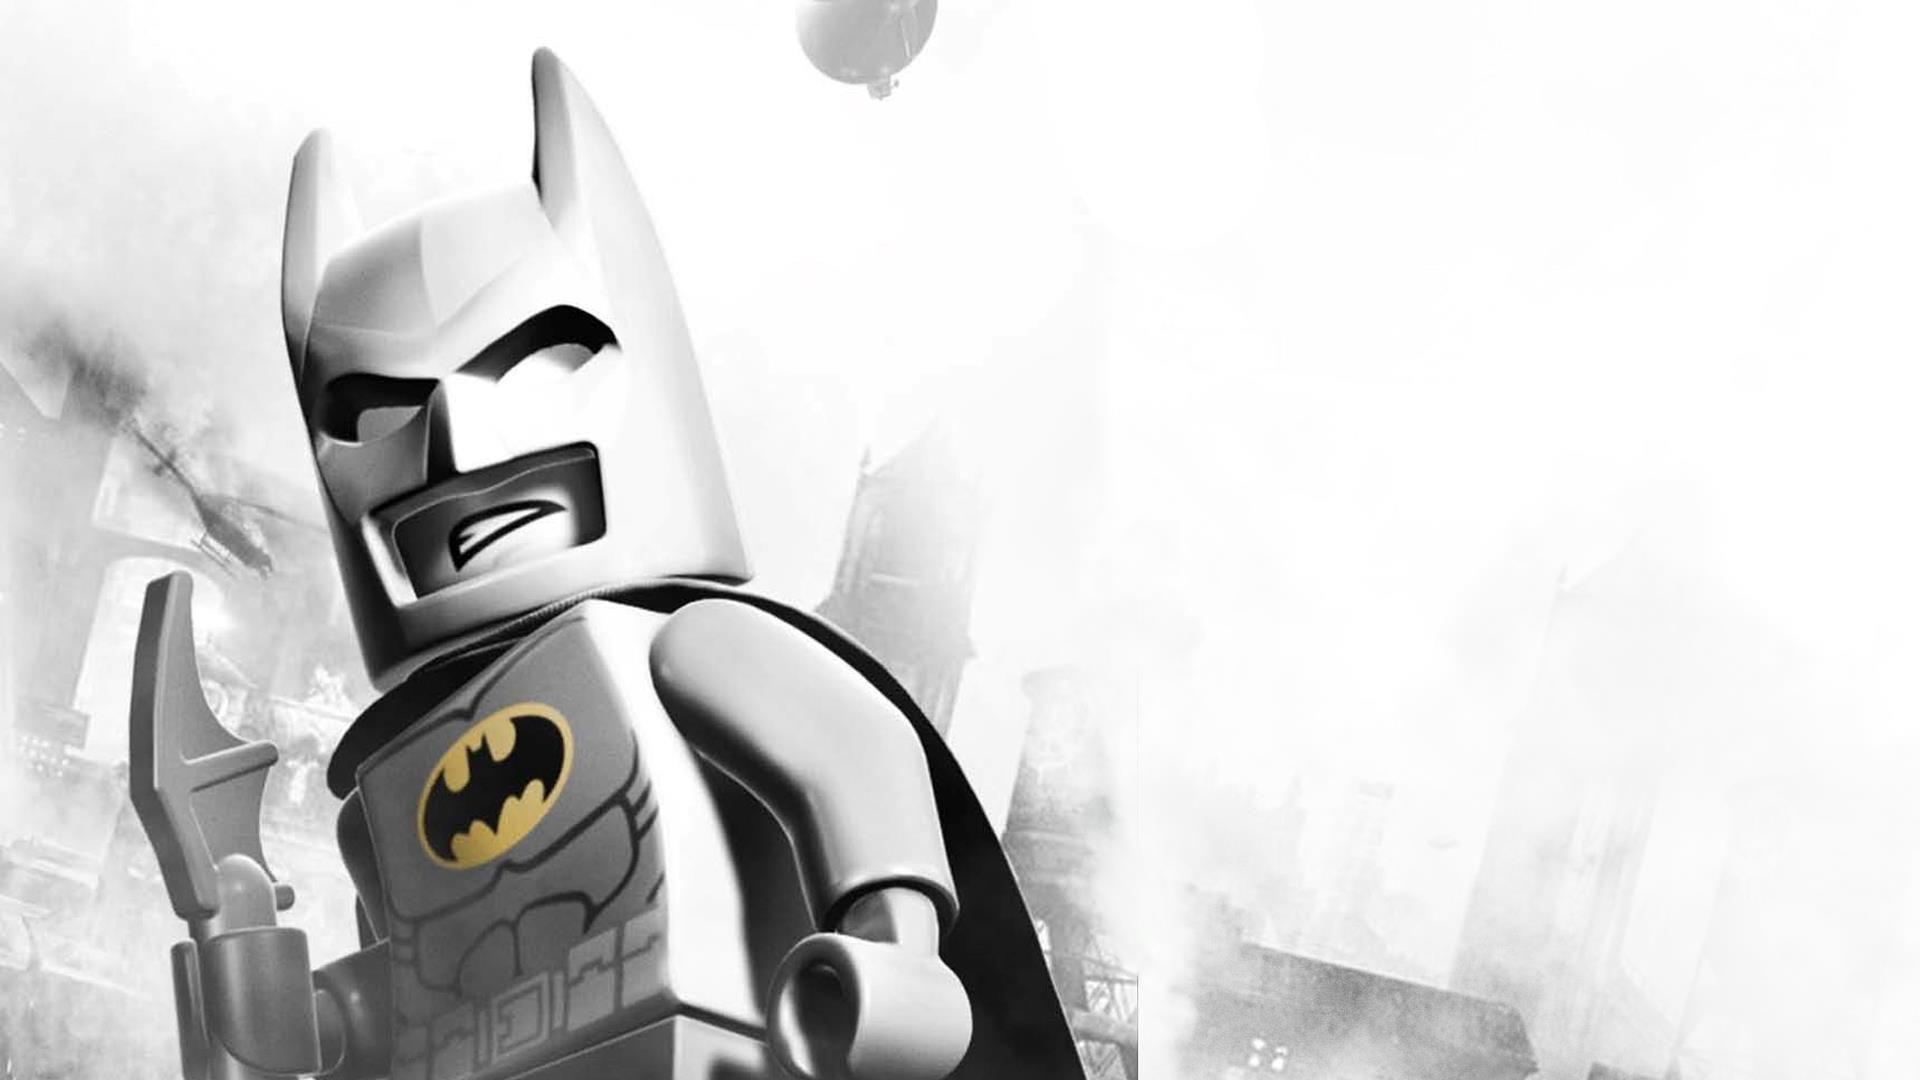 LEGO Wallpaper Special LEGO Themes Eurobricks Forums